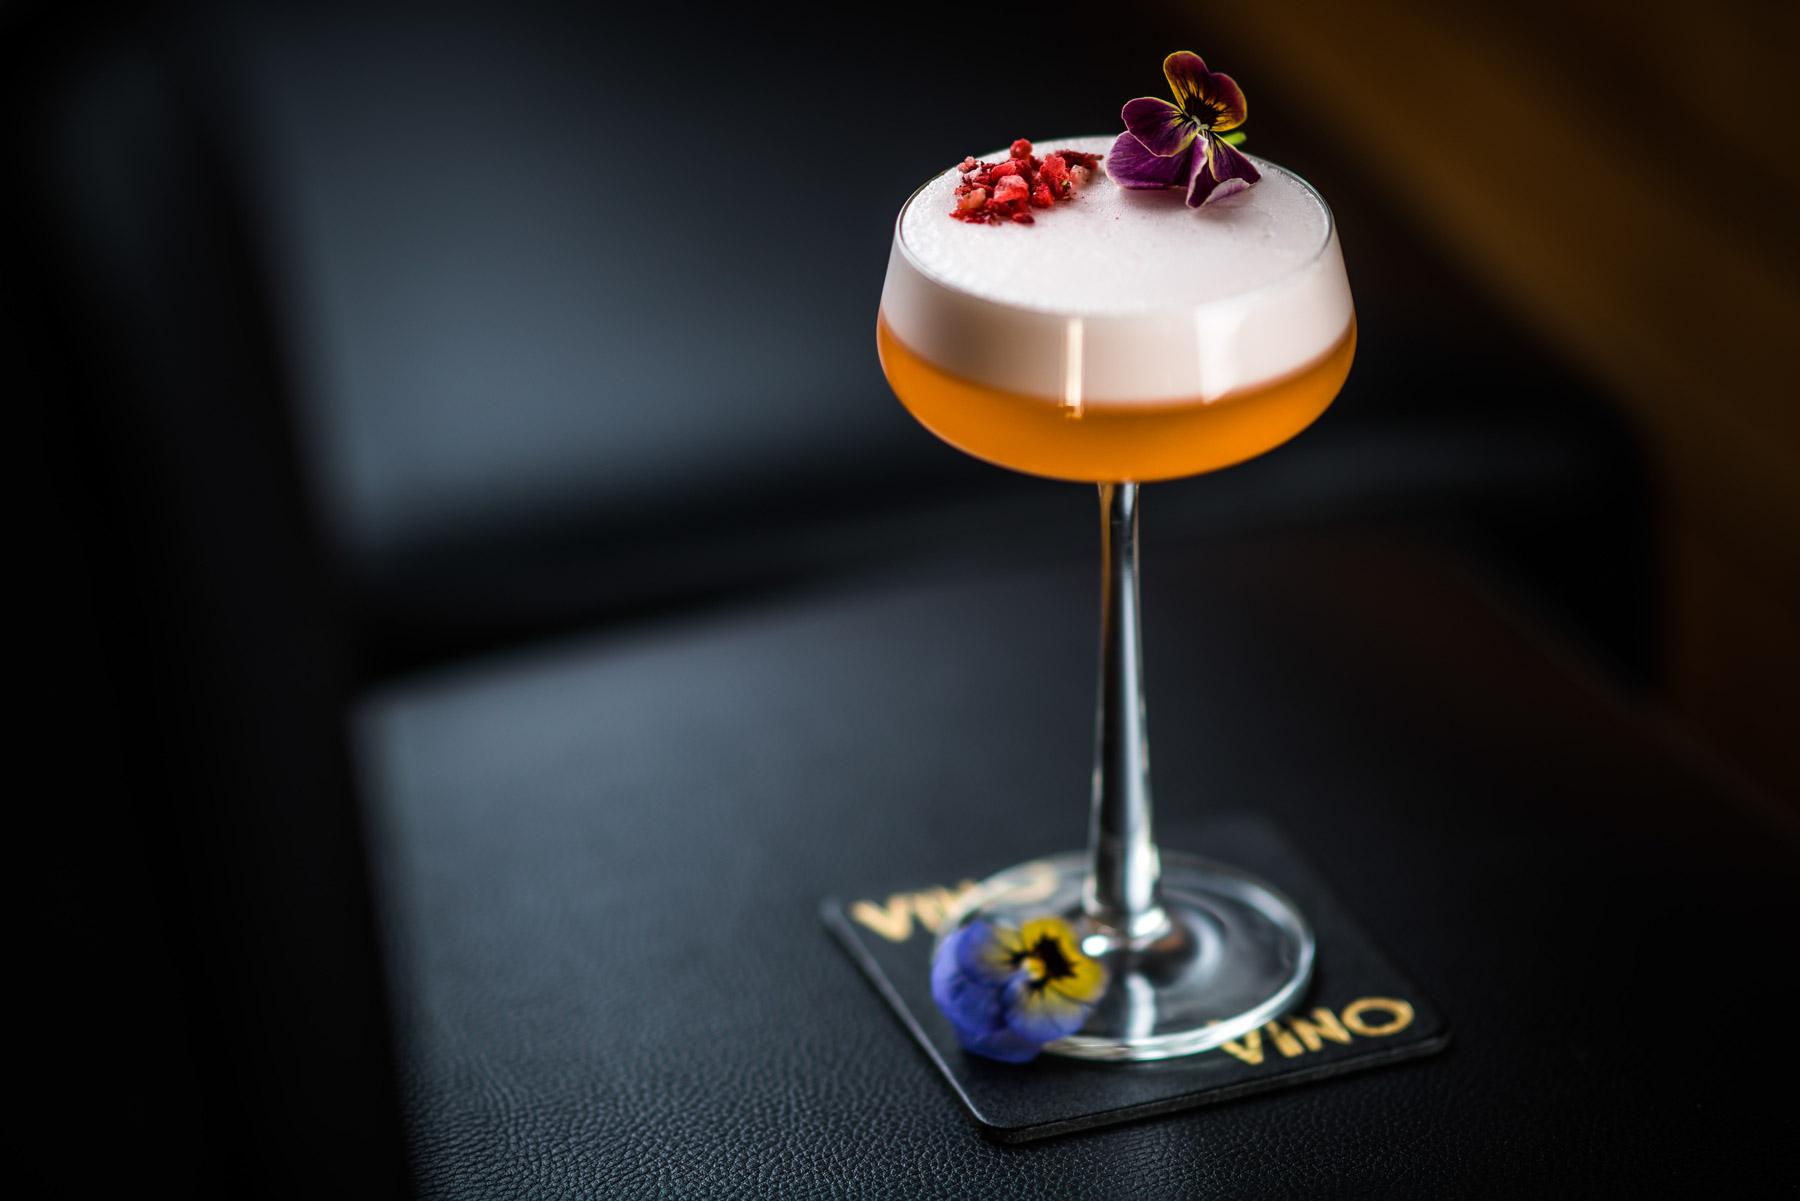 Cocktails at Vino Vino Bath